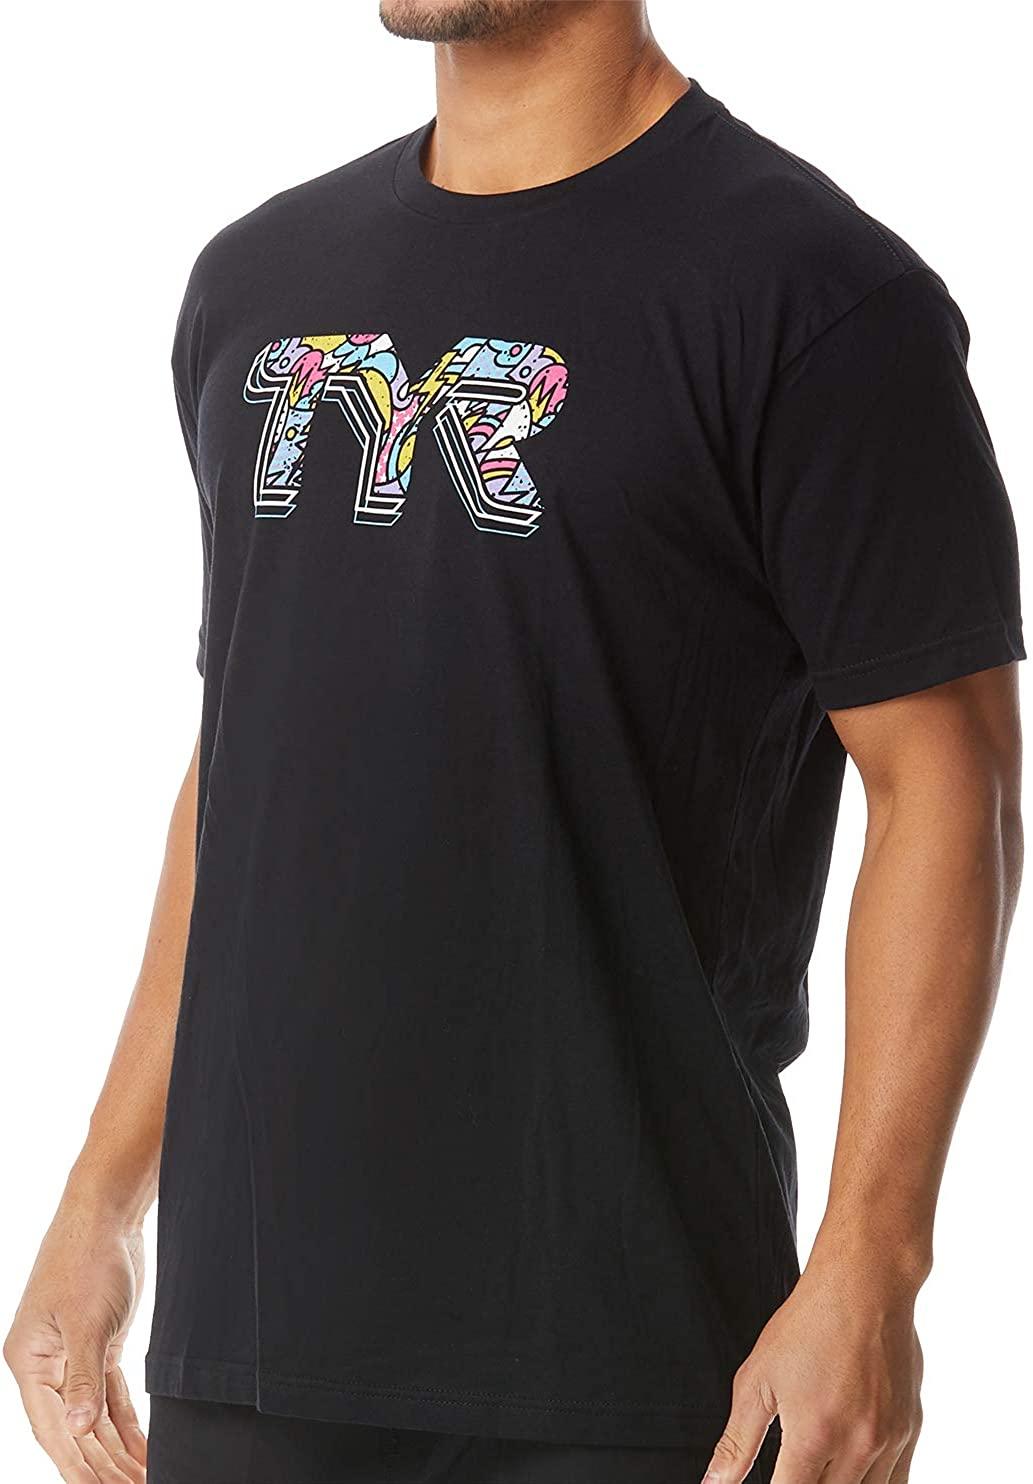 TYR Men's Street Graphic Tee